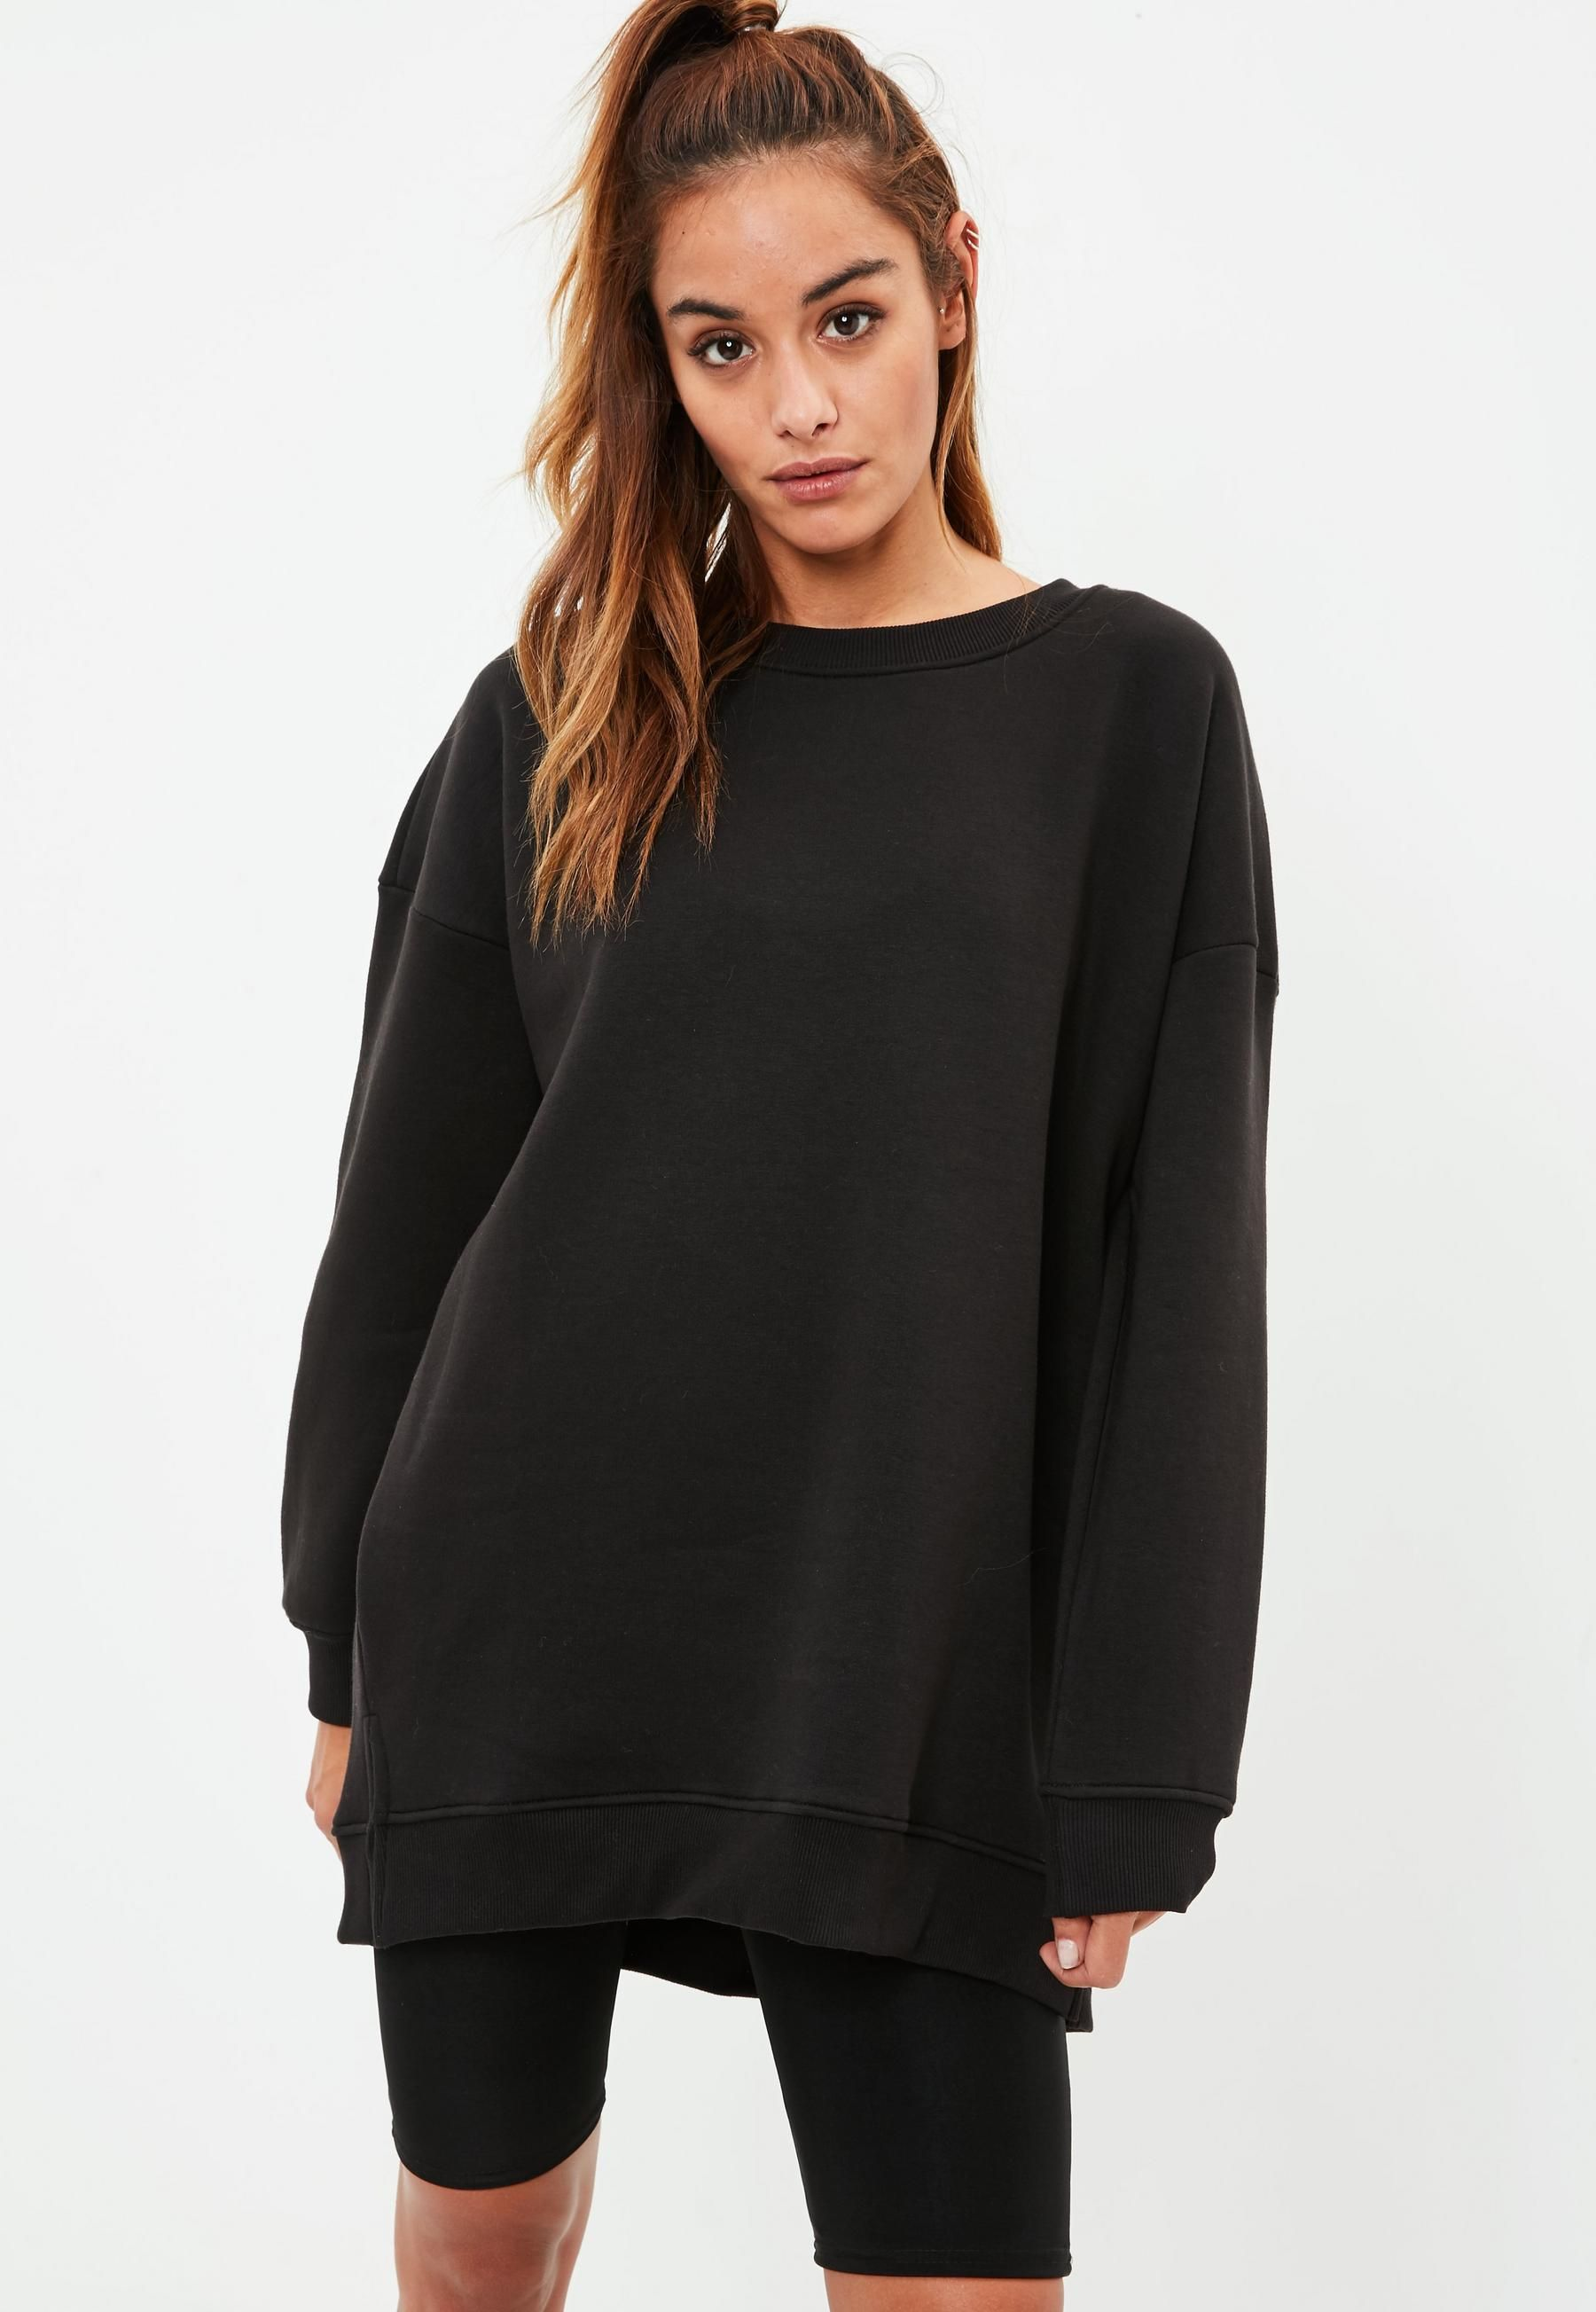 Black Fleeceback Oversized Crew Neck Sweatshirt Basic Sweatshirt Oversized Sweatshirt Outfit Crewneck Outfit [ 2607 x 1800 Pixel ]